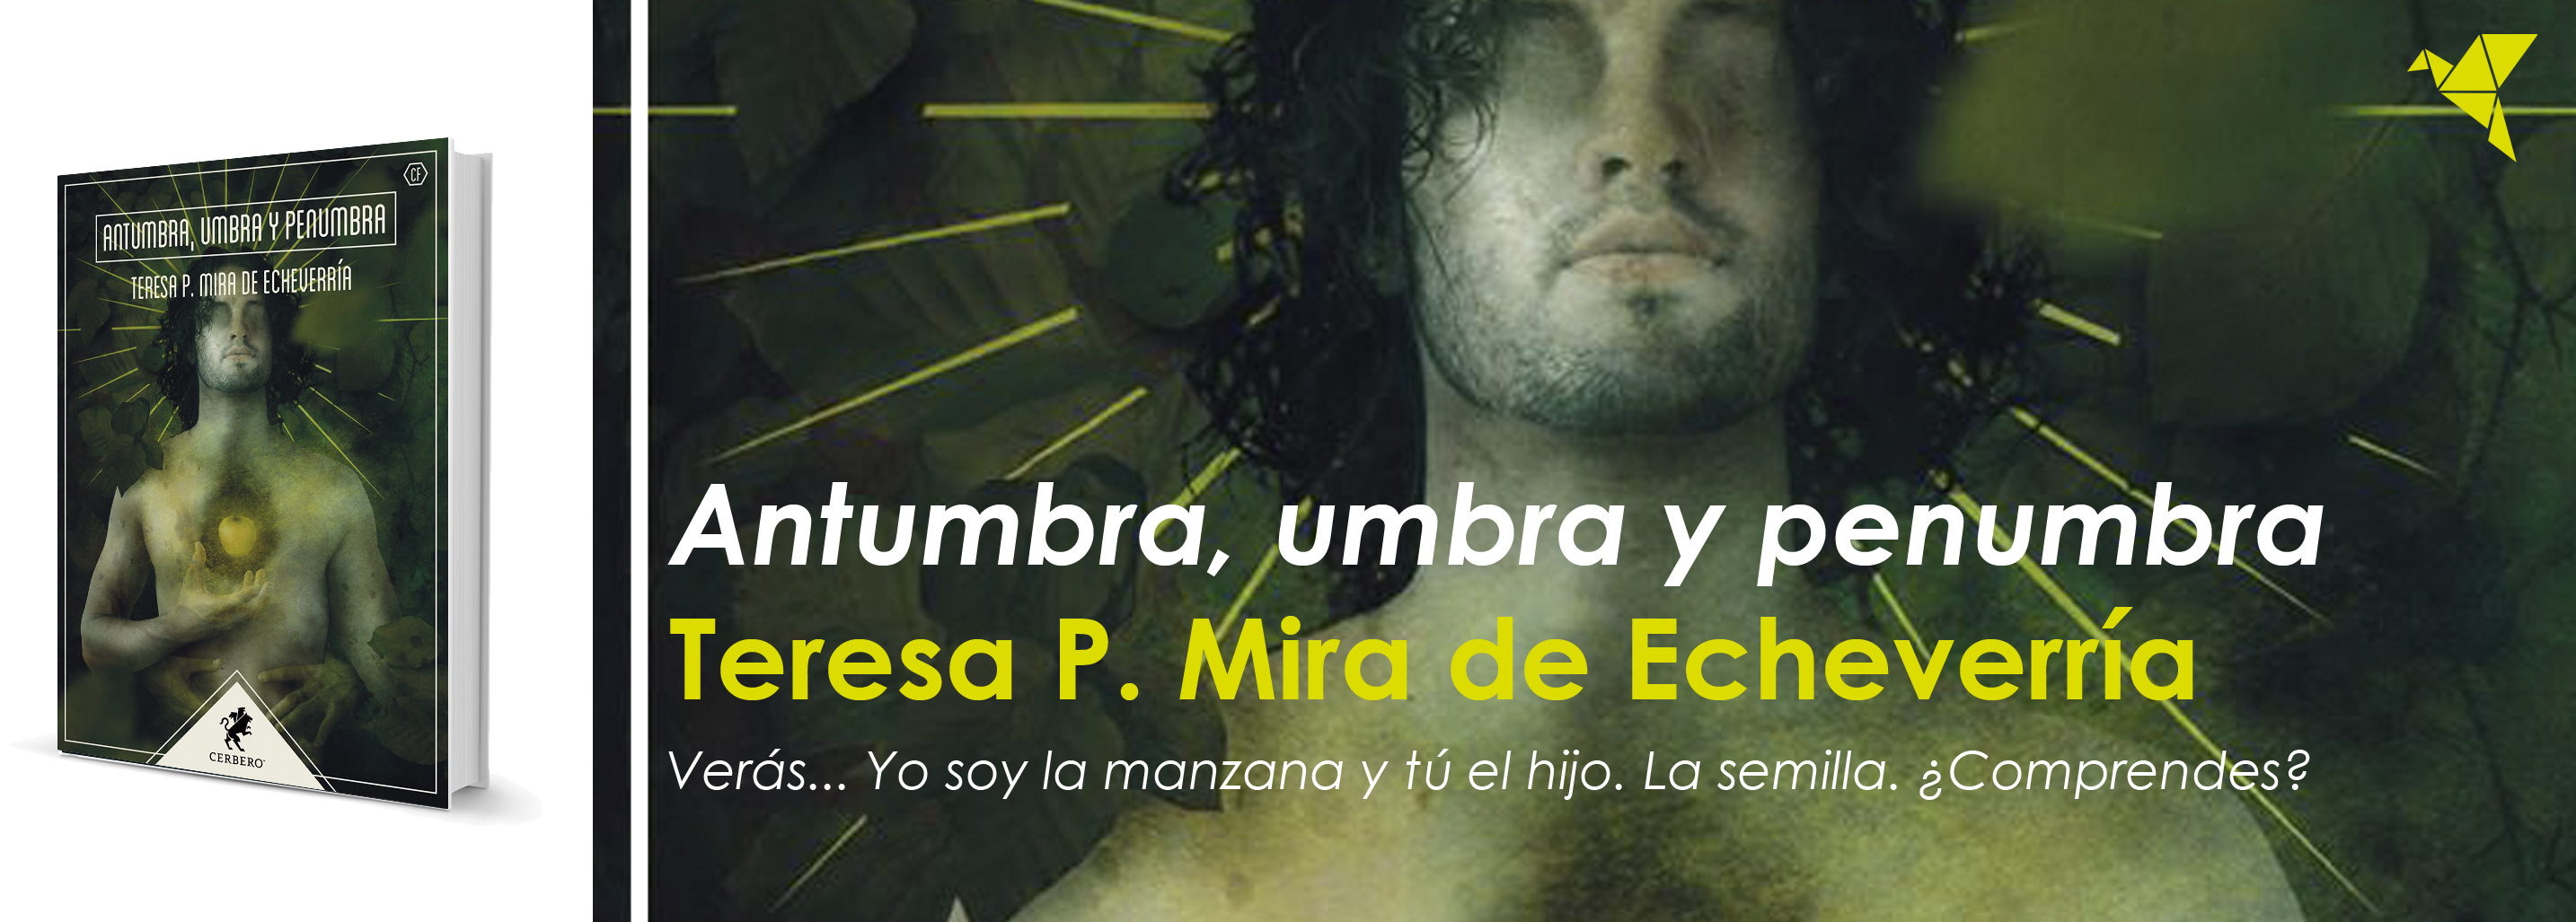 Antumbra, umbra y penumbra, de Teresa P. Mira de Echeverría